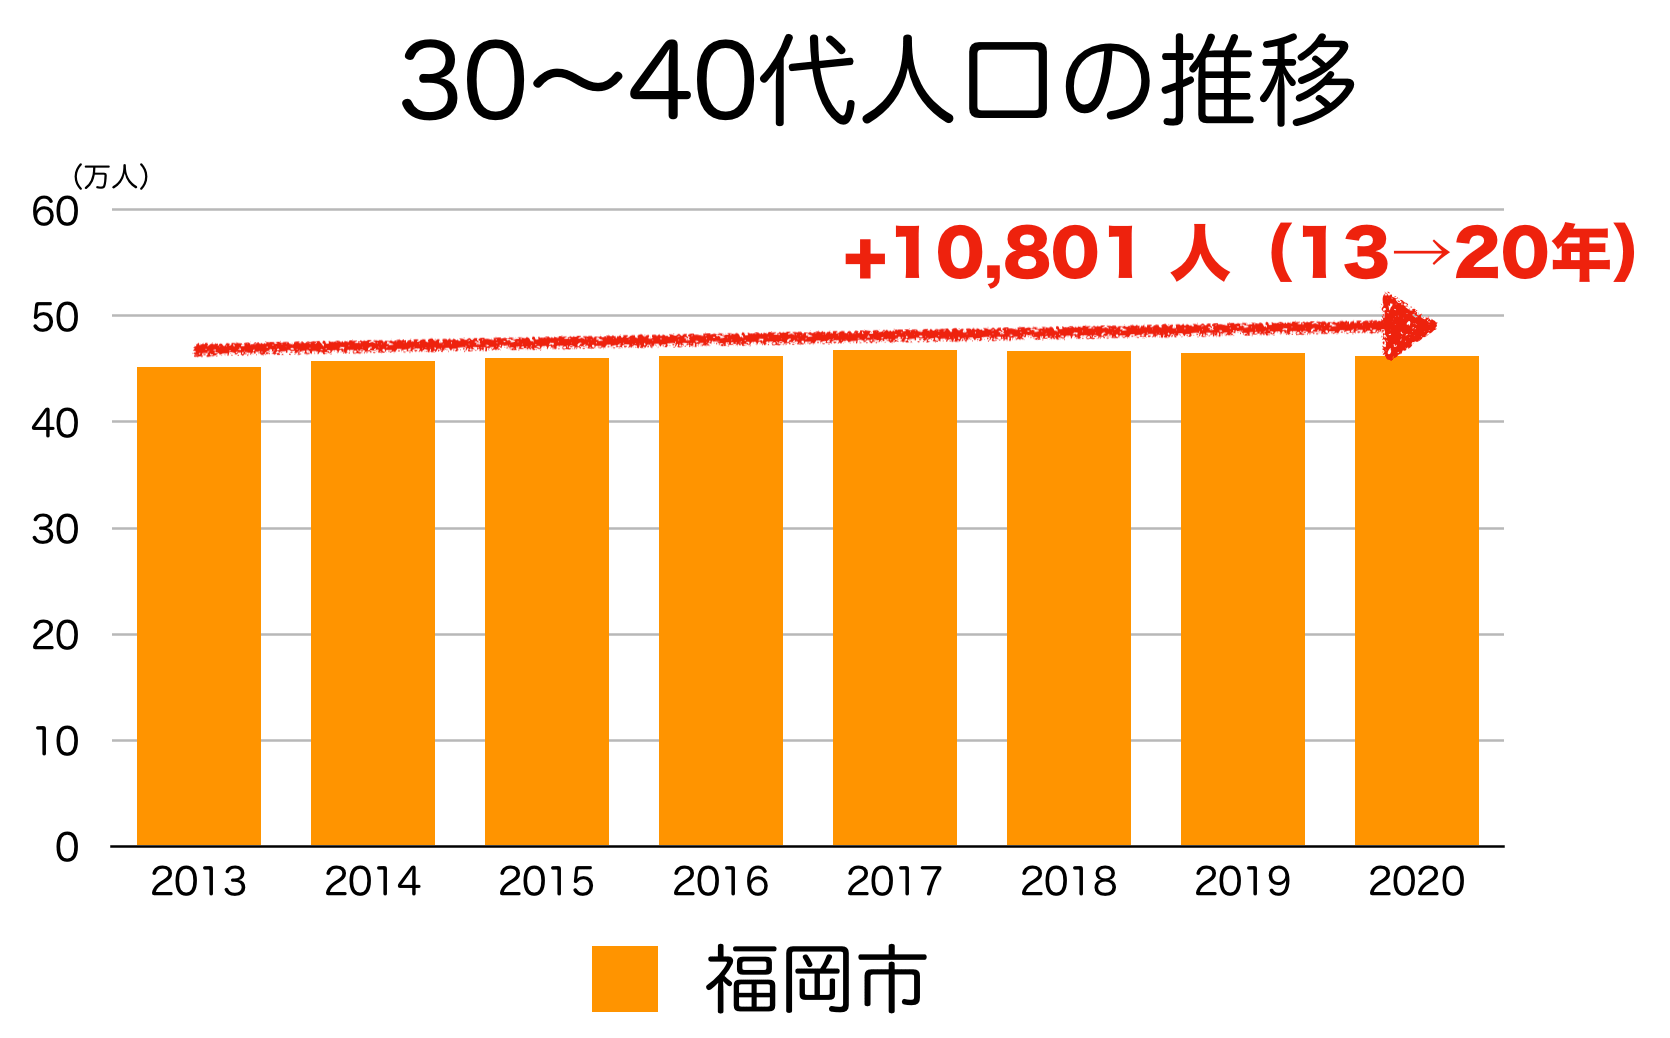 福岡市の30〜40代人口の推移